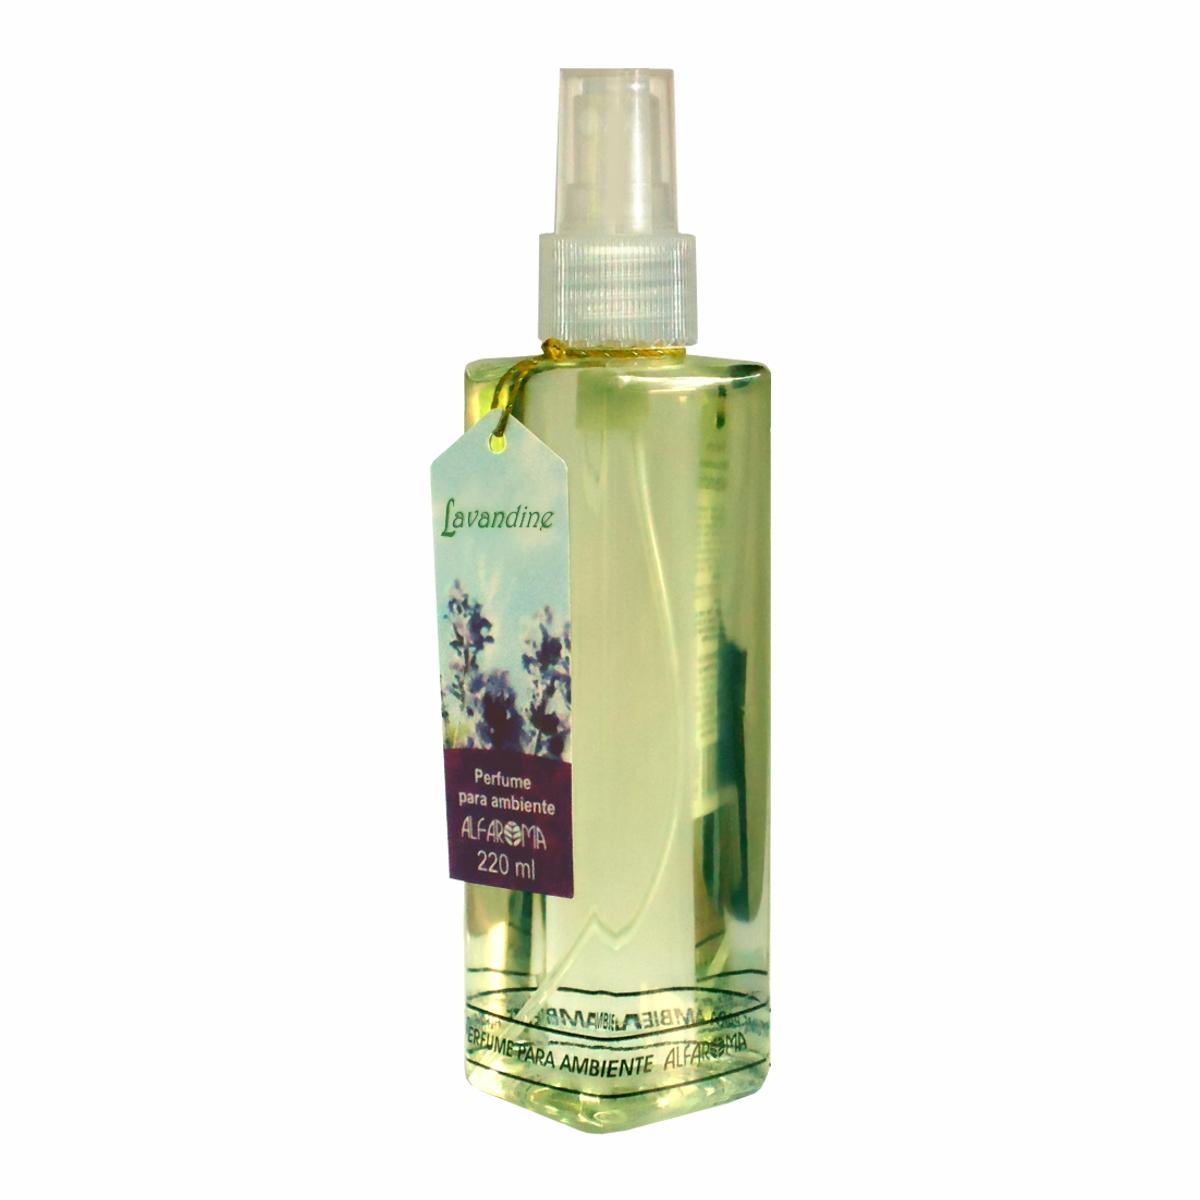 Perfume para ambiente Lavandine